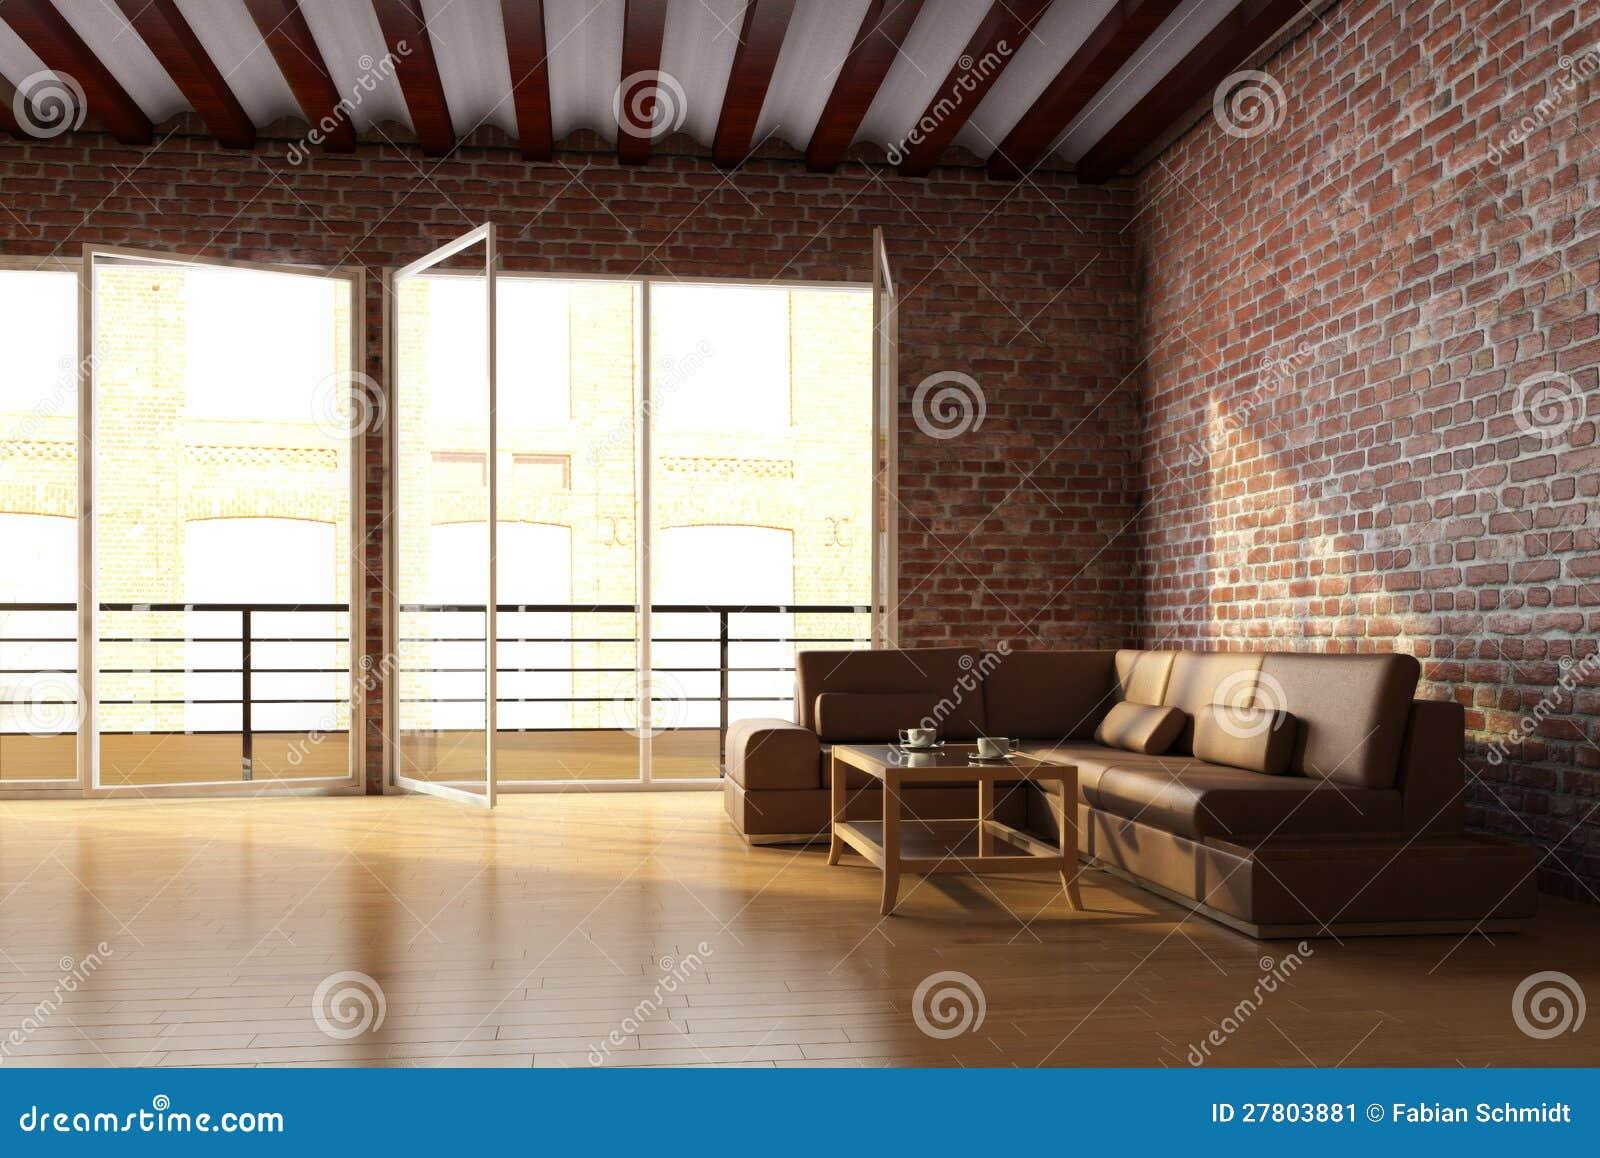 Loft Interior With Brick Wall Stock Image Image 27803881